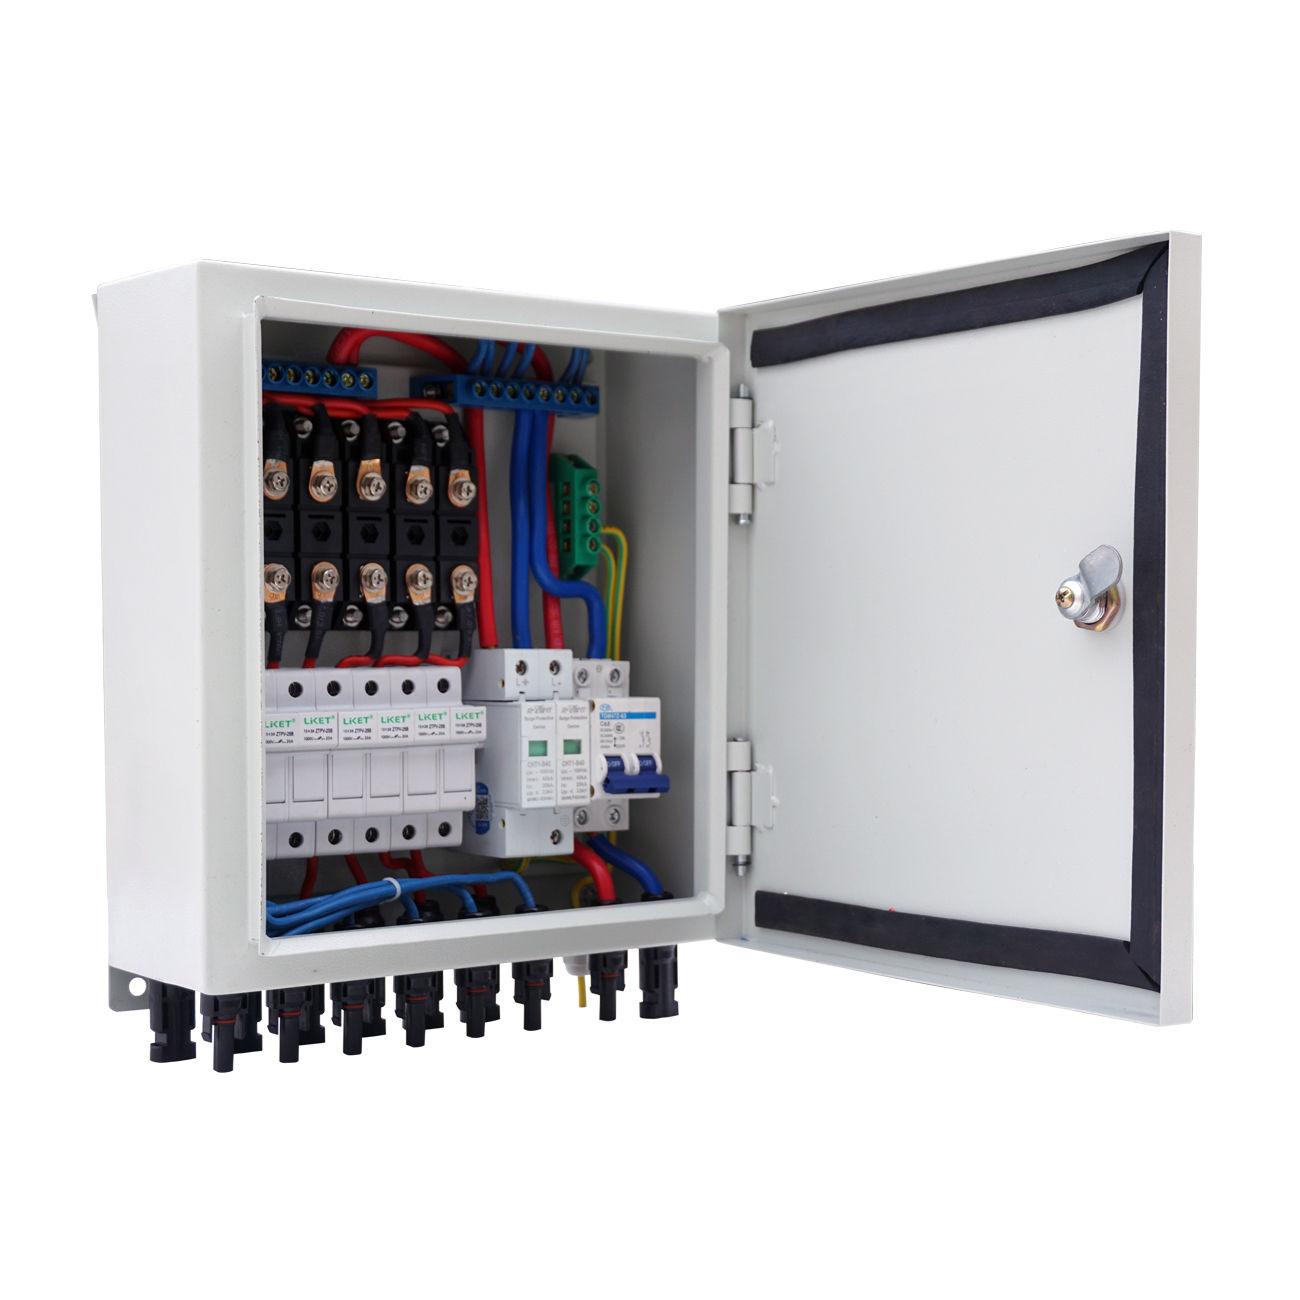 6 String Solar PV Combiner Box W Circuit Breakers Surge